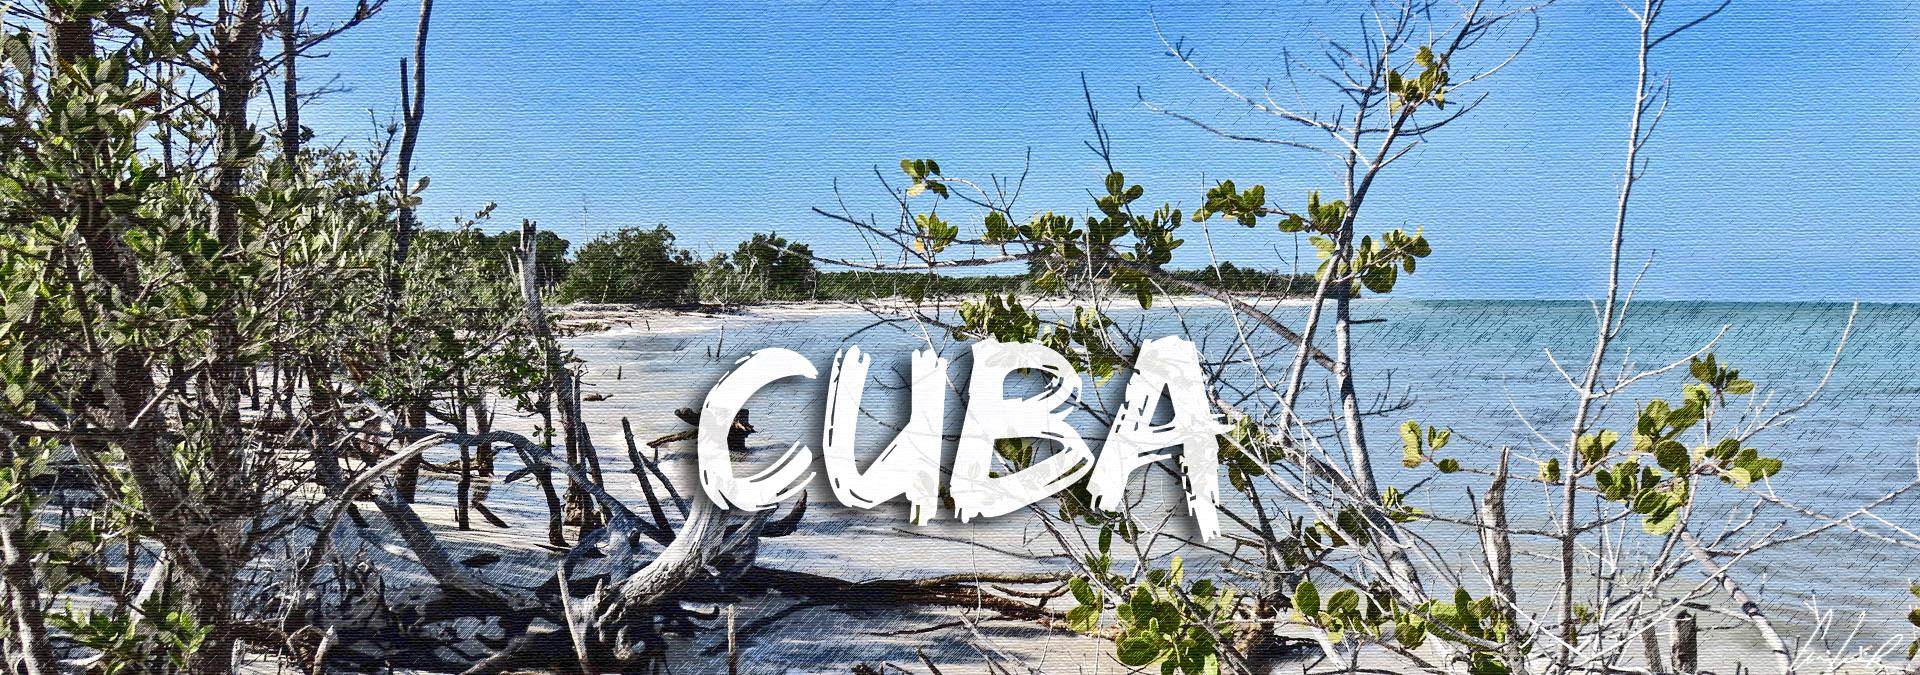 C-Ludik - Pays visité : Cuba